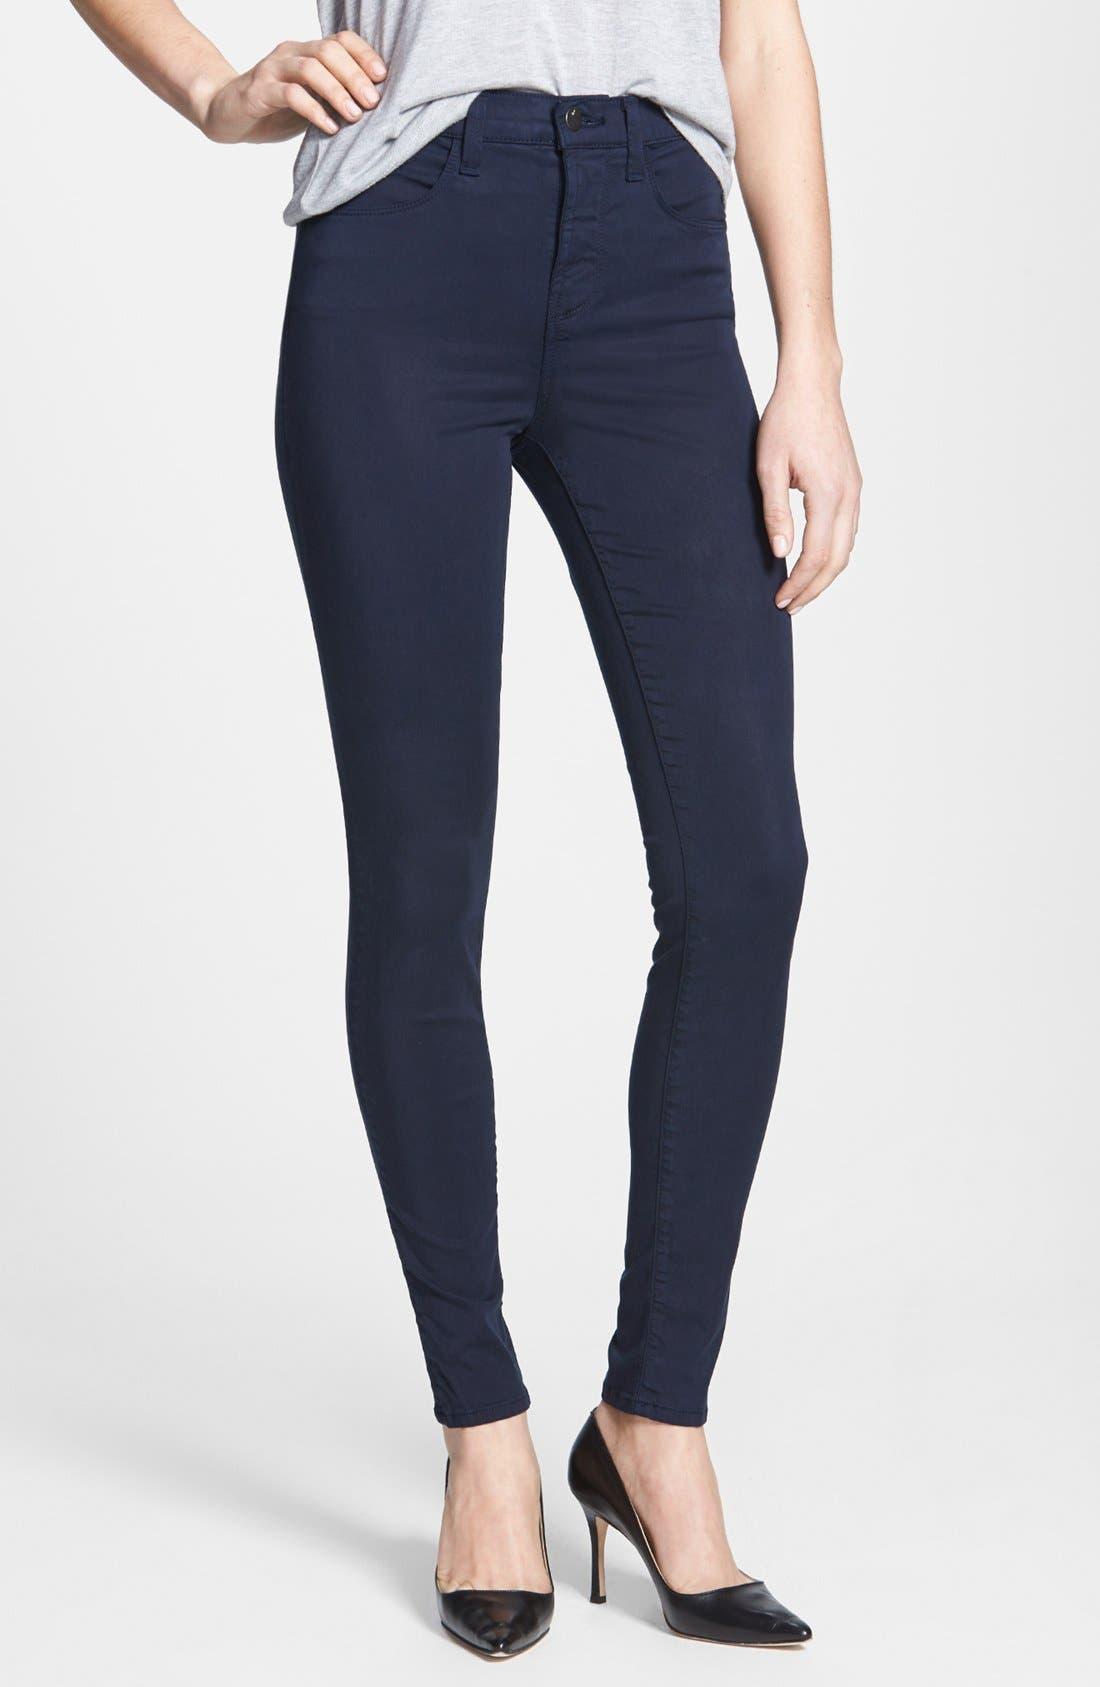 Alternate Image 1 Selected - J Brand 'Maria 2311' High Rise Skinny Jeans (Marine)